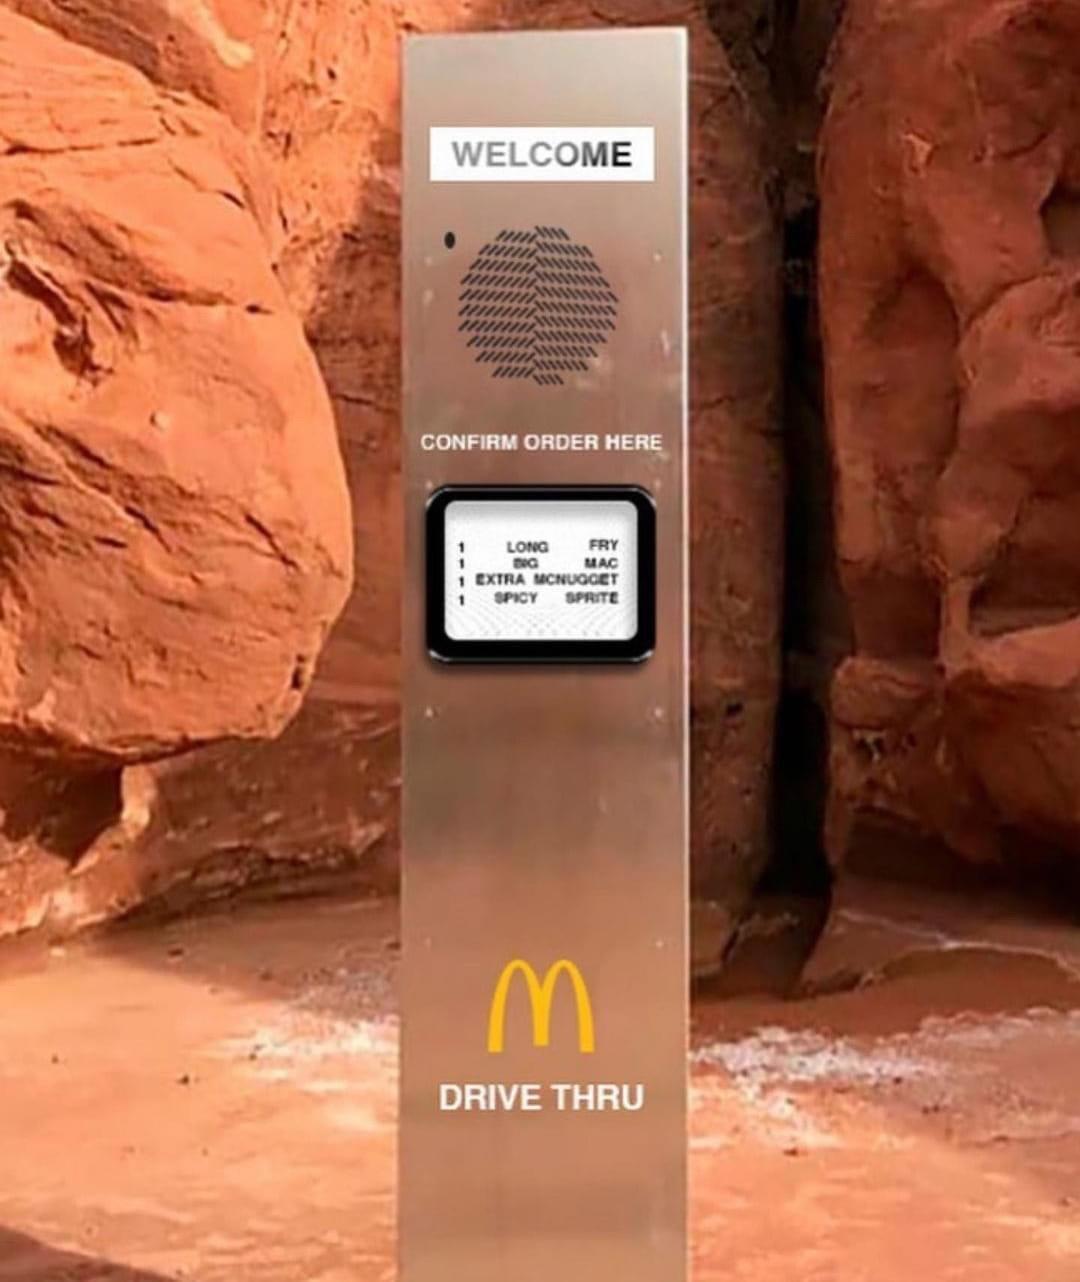 Mysterious monolith McDonald's meme